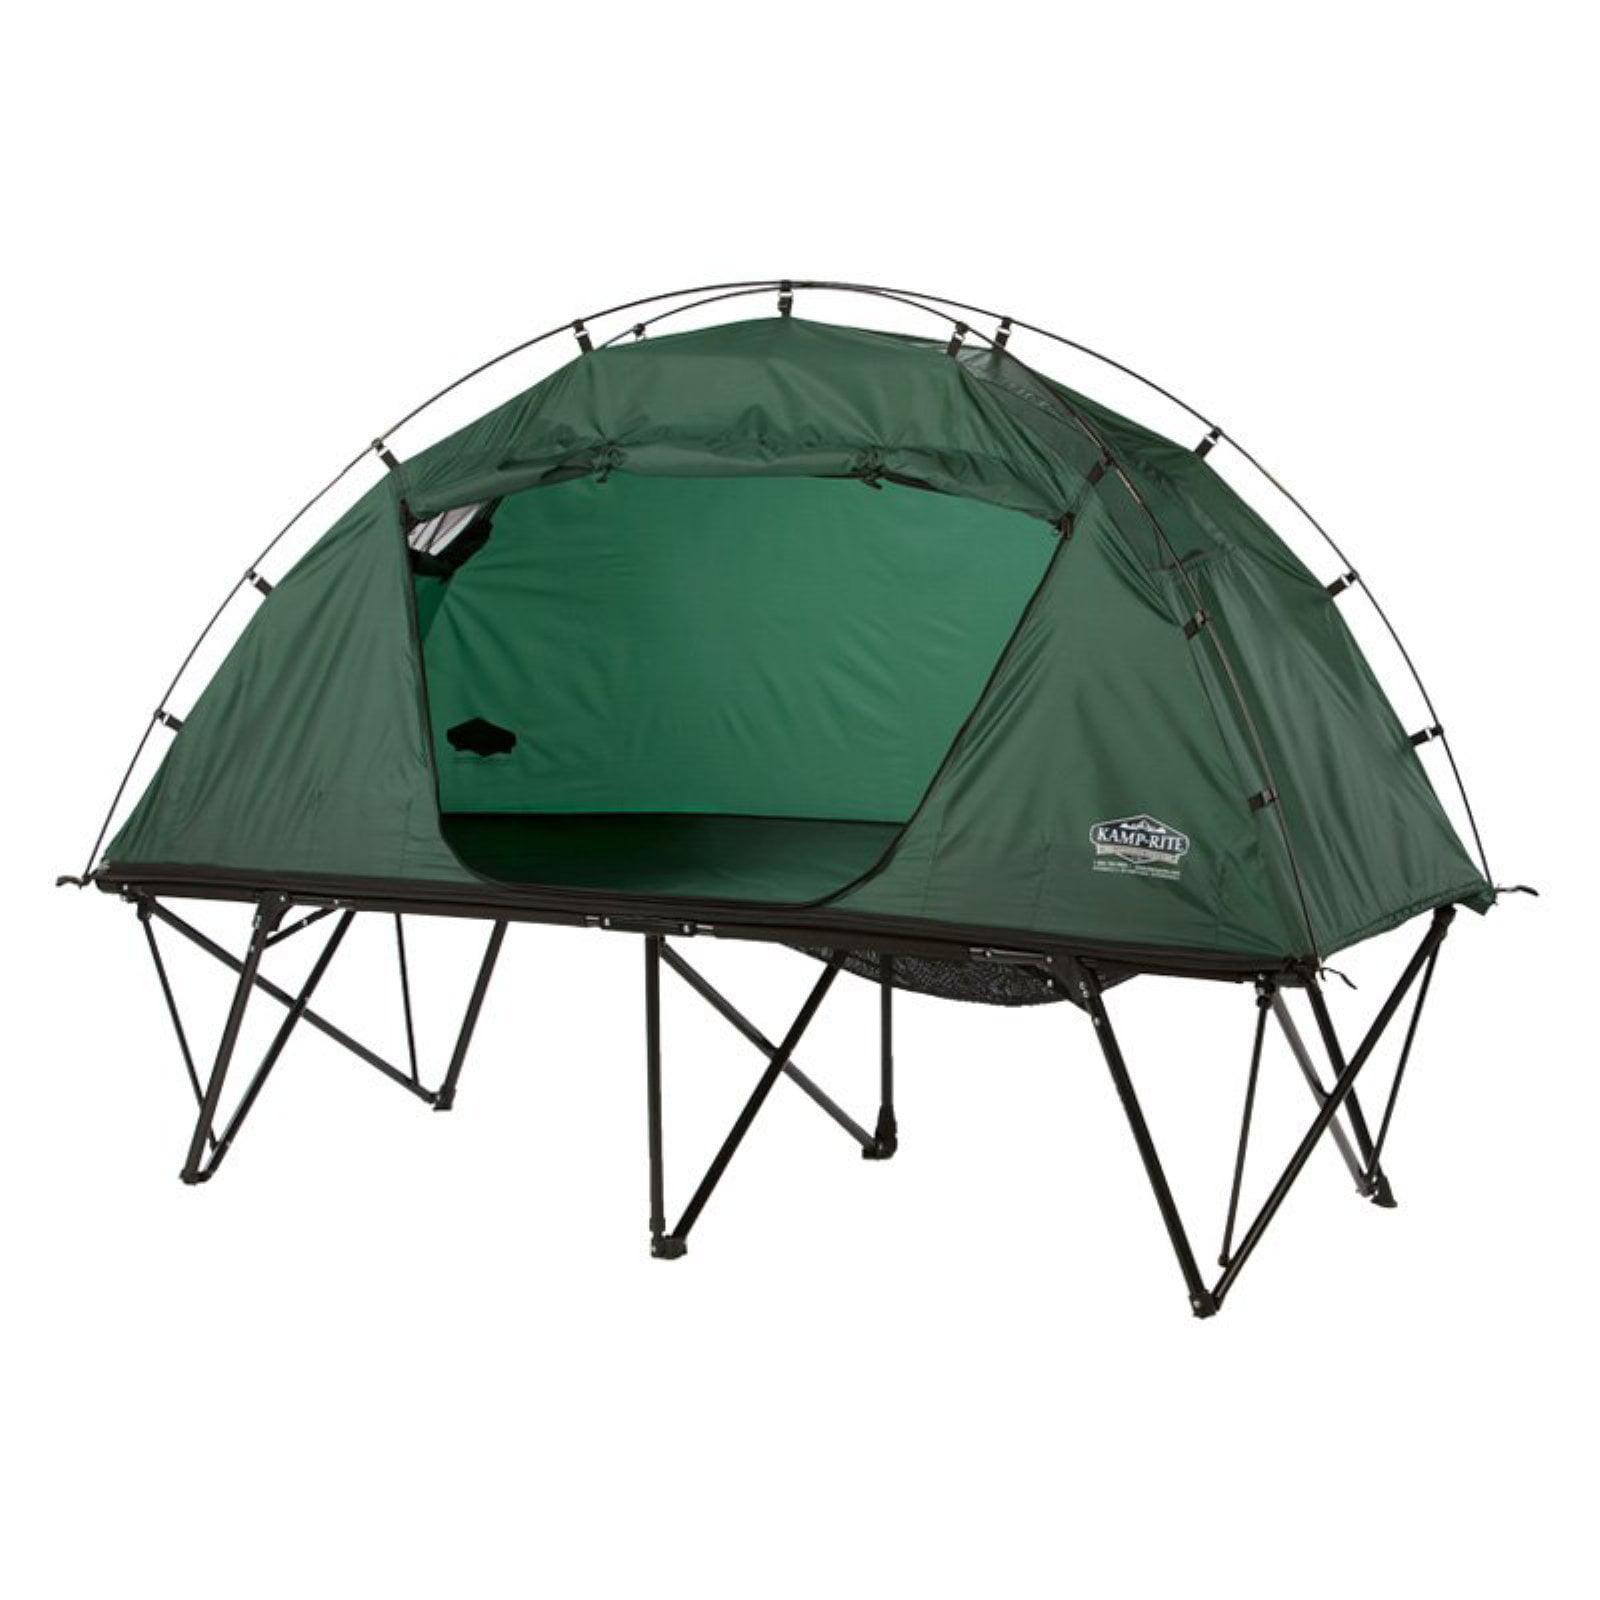 Tent Cot Collapsible Combo Tent Cot  sc 1 st  Walmart & Tent Cots